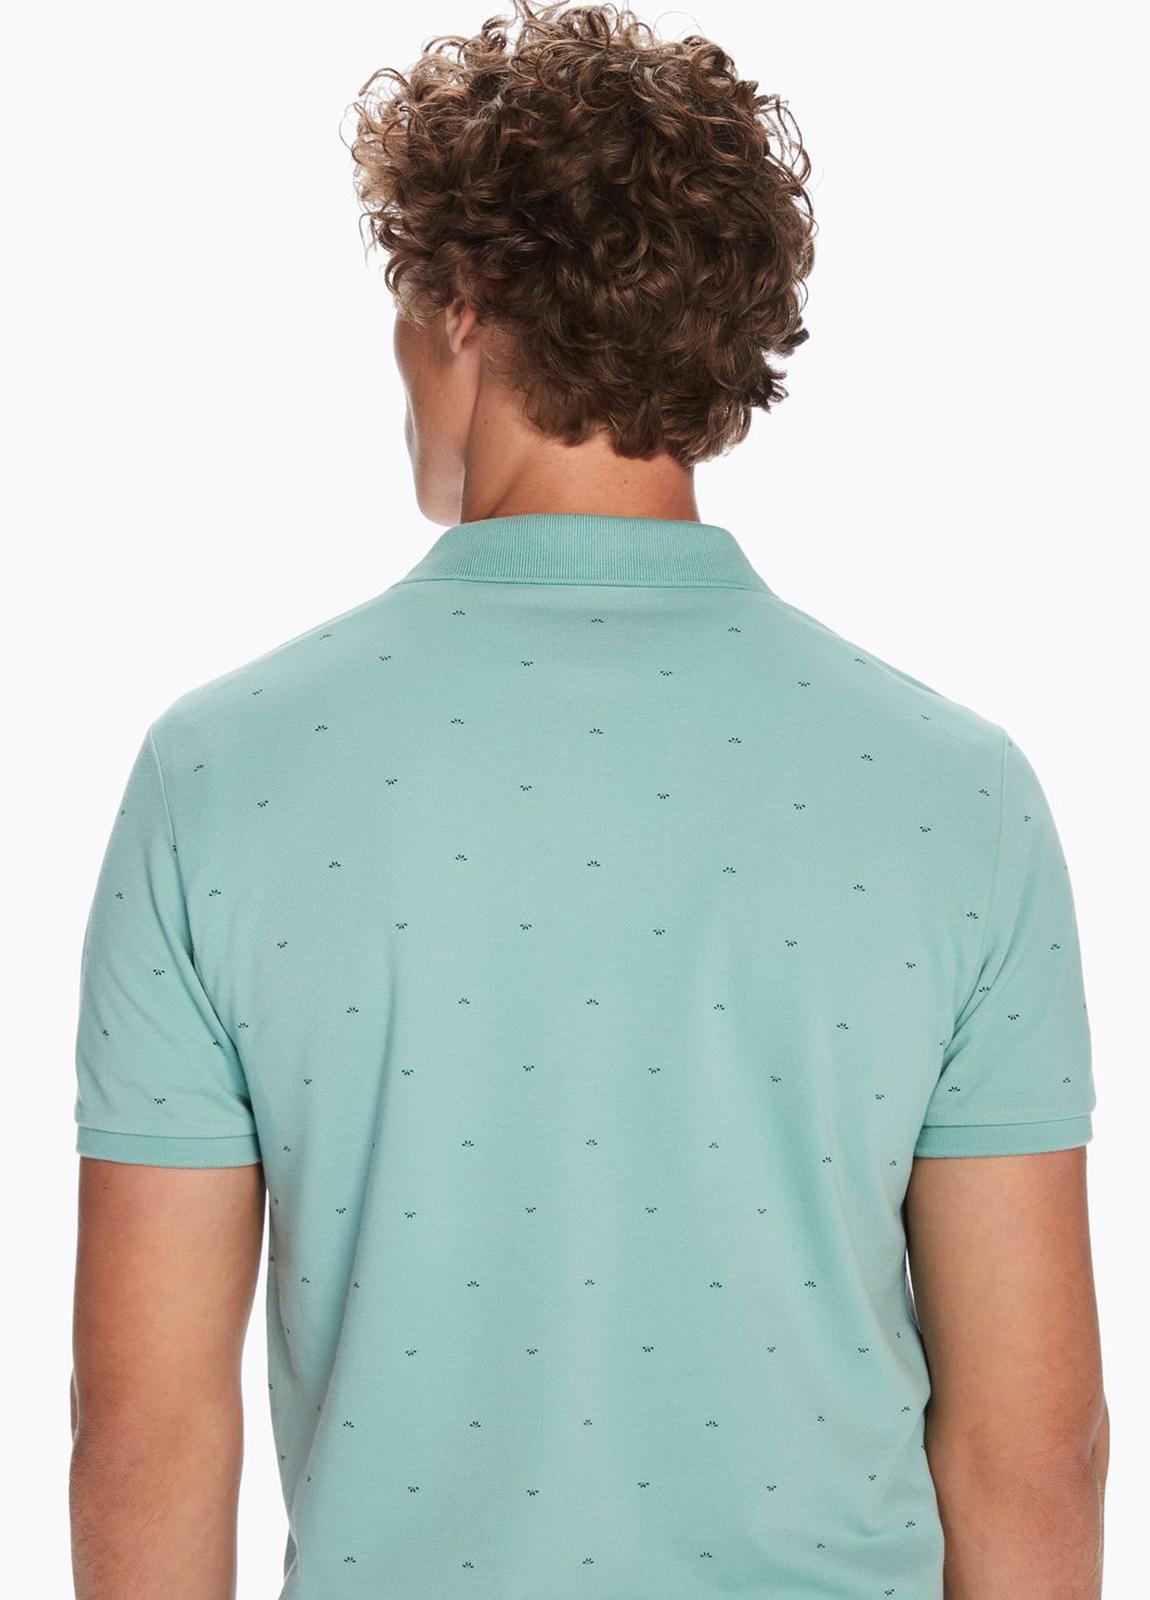 Polo manga corta de piqué color verde con motivos estampados. 100% algodón. - Ítem1